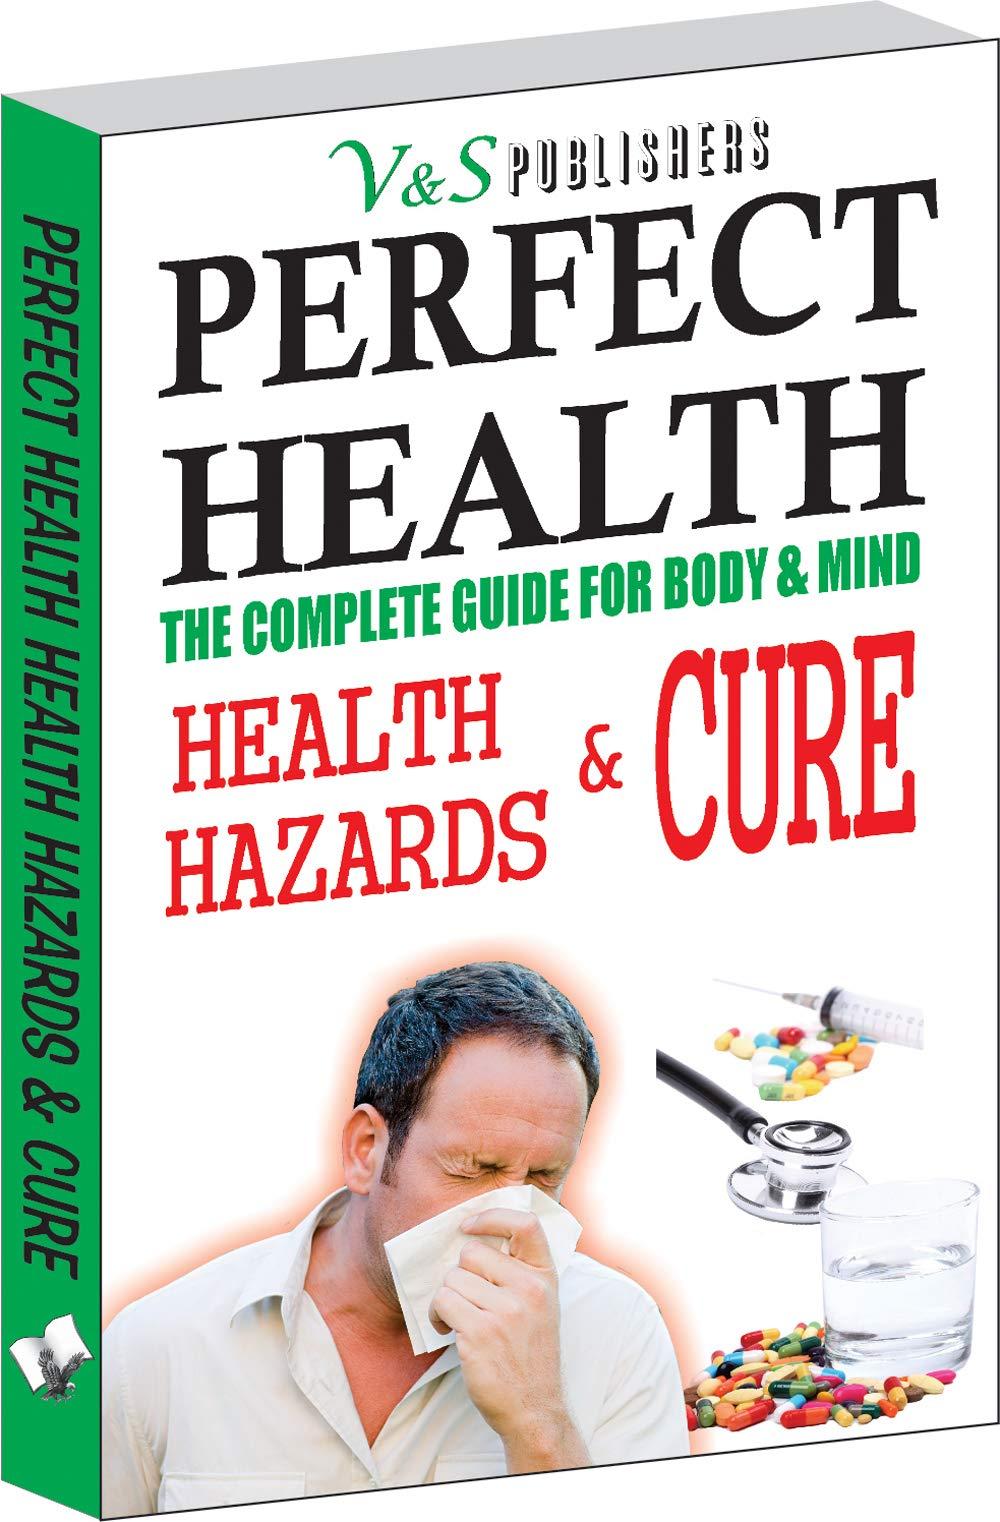 PERFECT HEALTH: HEALTH HAZARDS & CURE